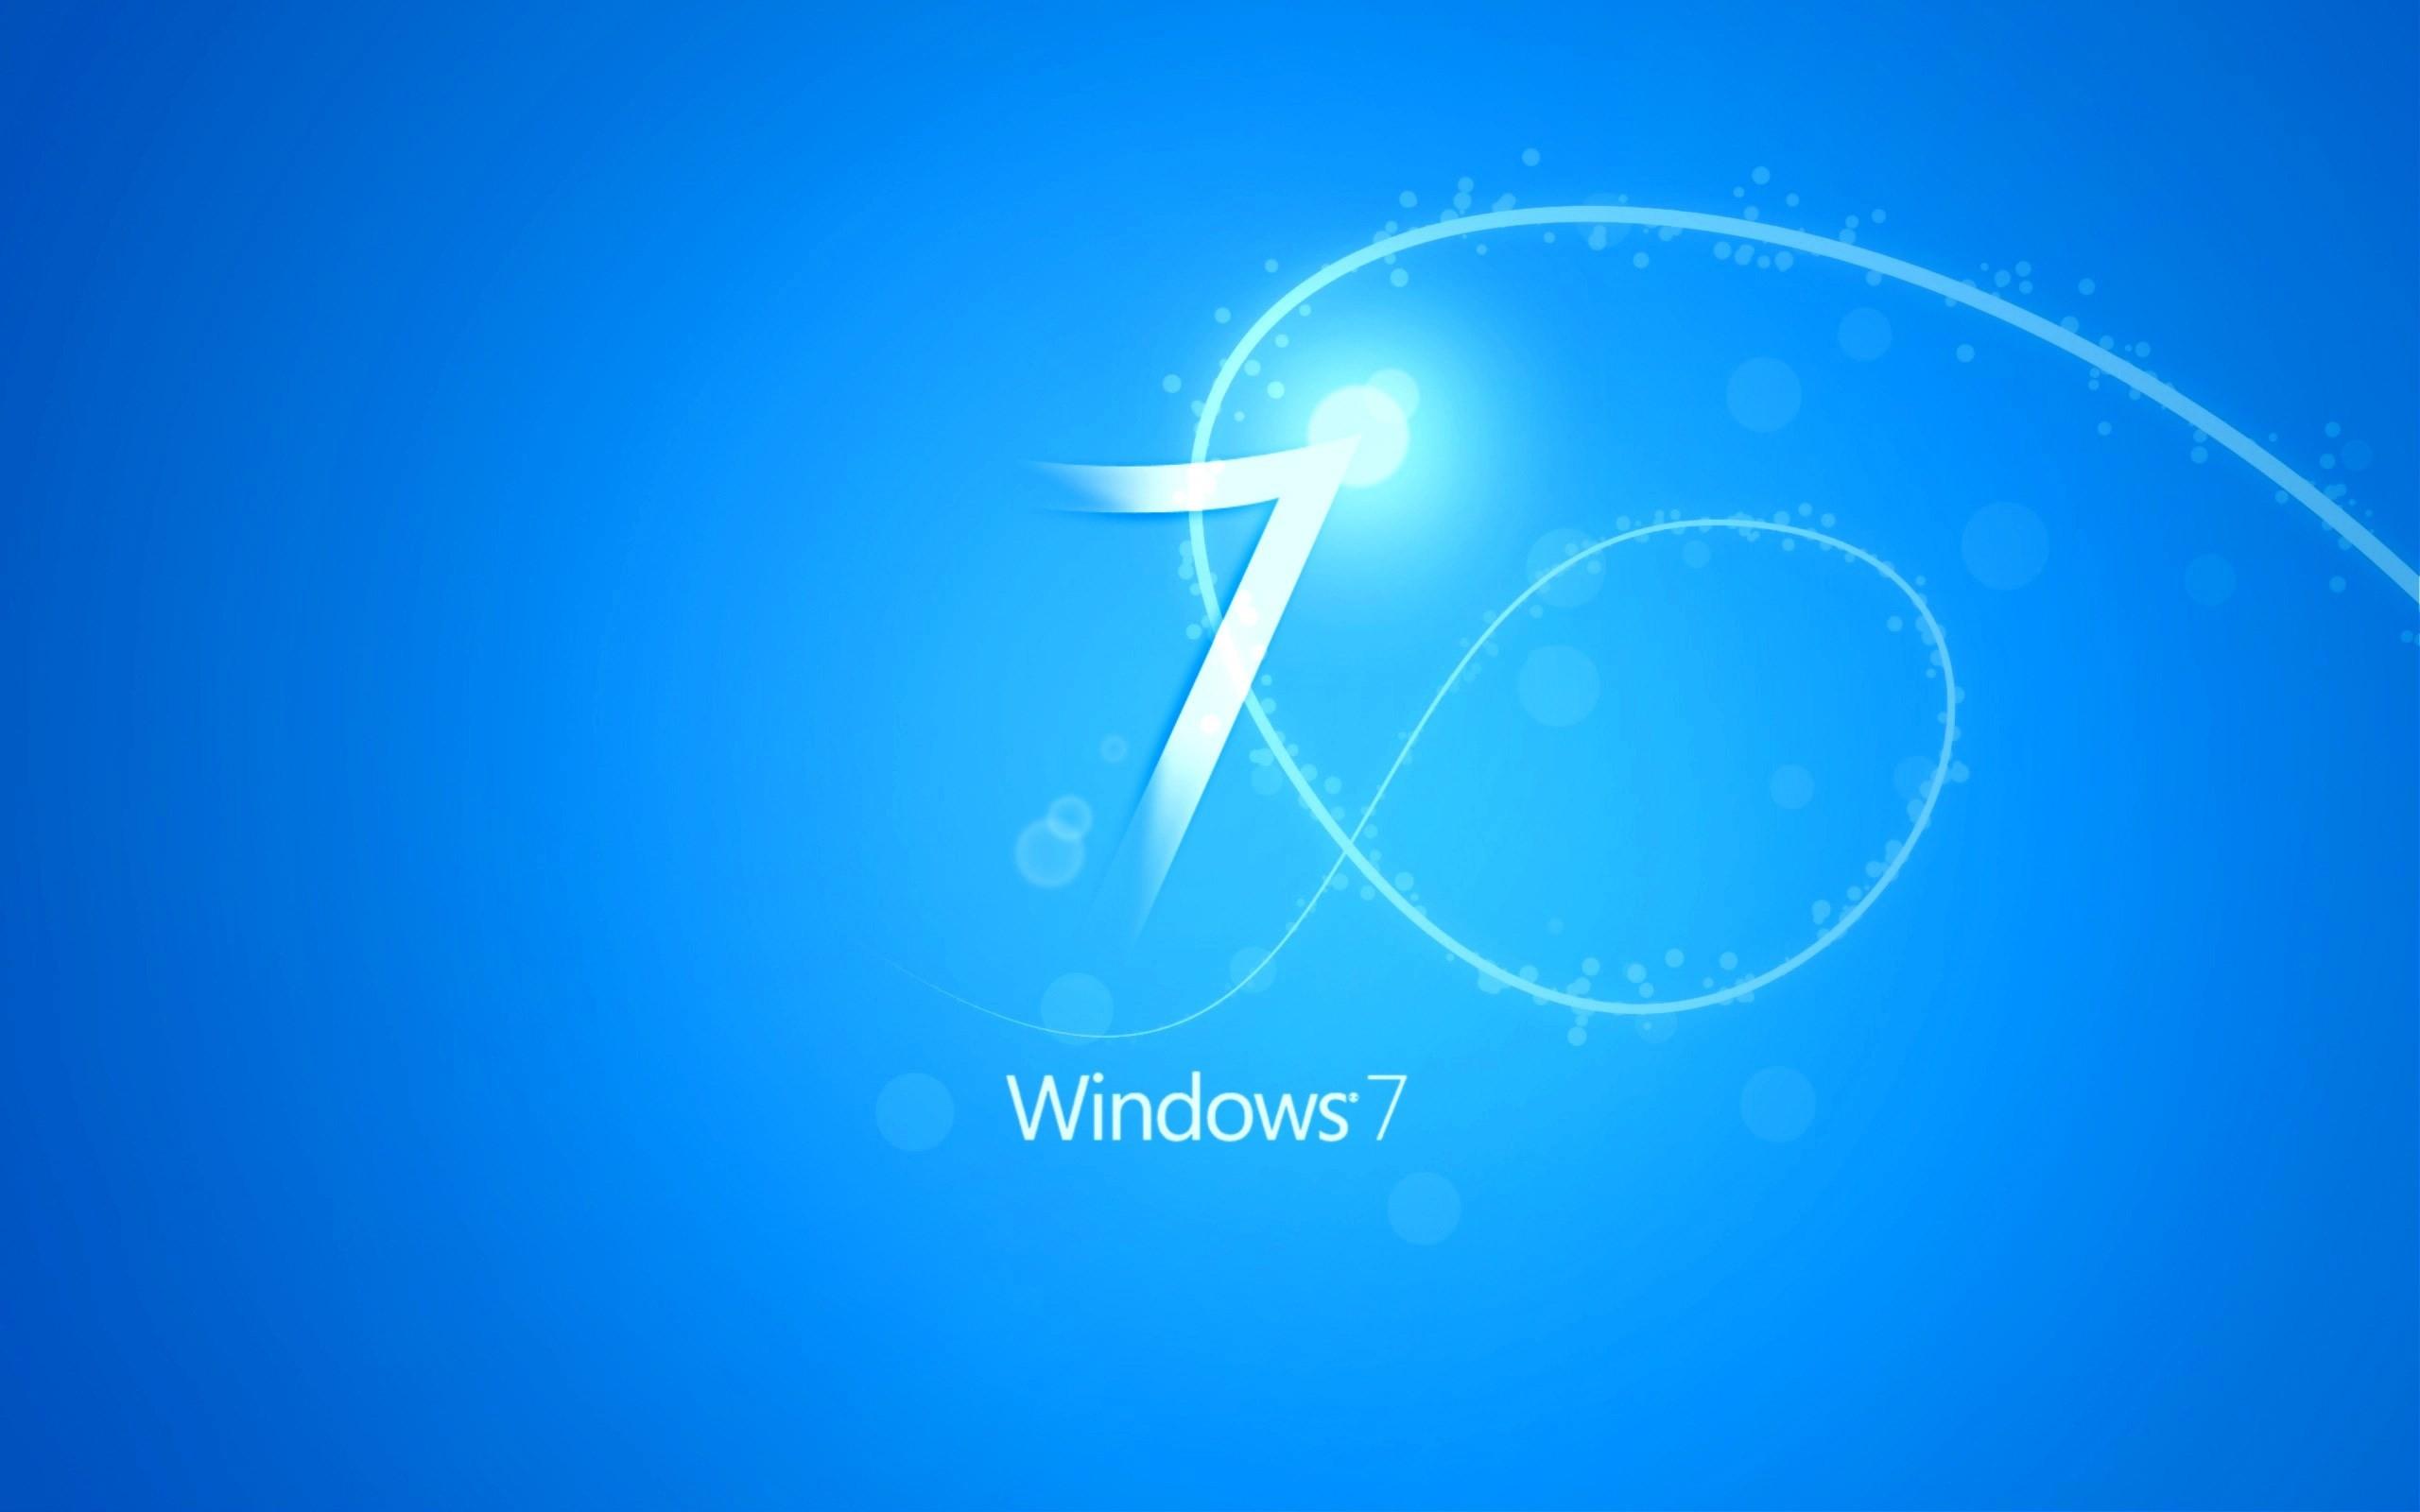 Windows Nt 40 Wallpaper 73 Images